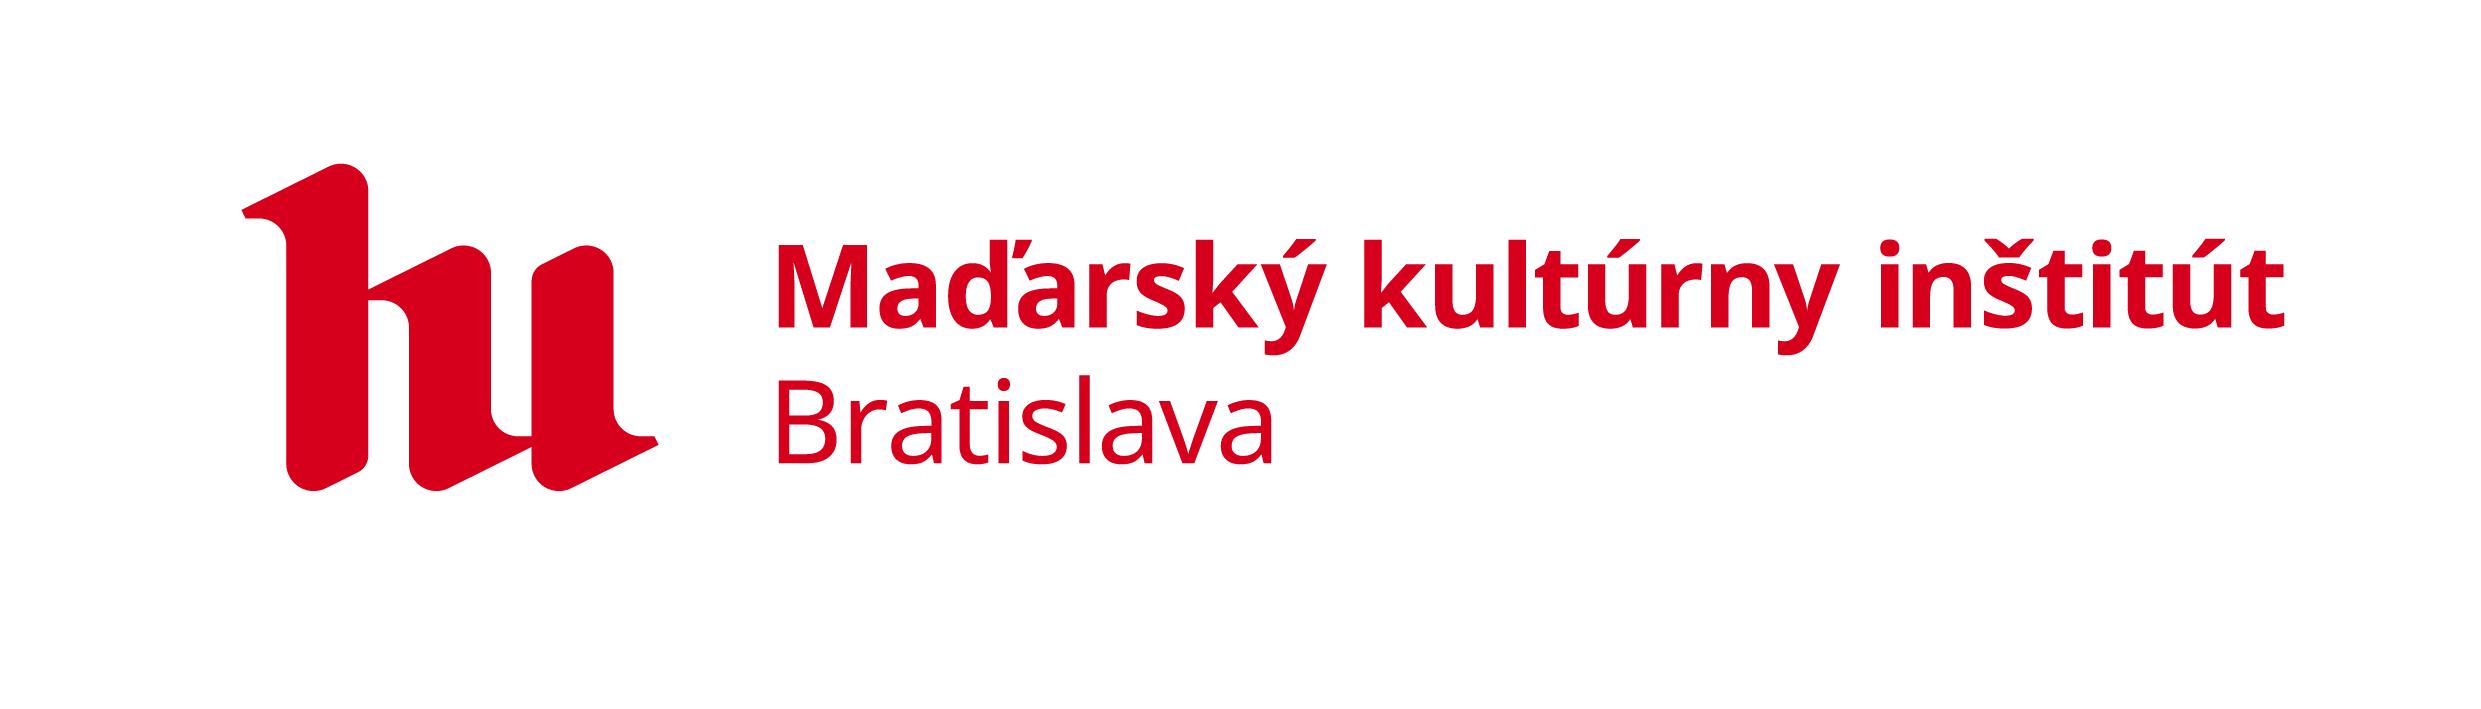 MKI_Bratislava_red_RGB